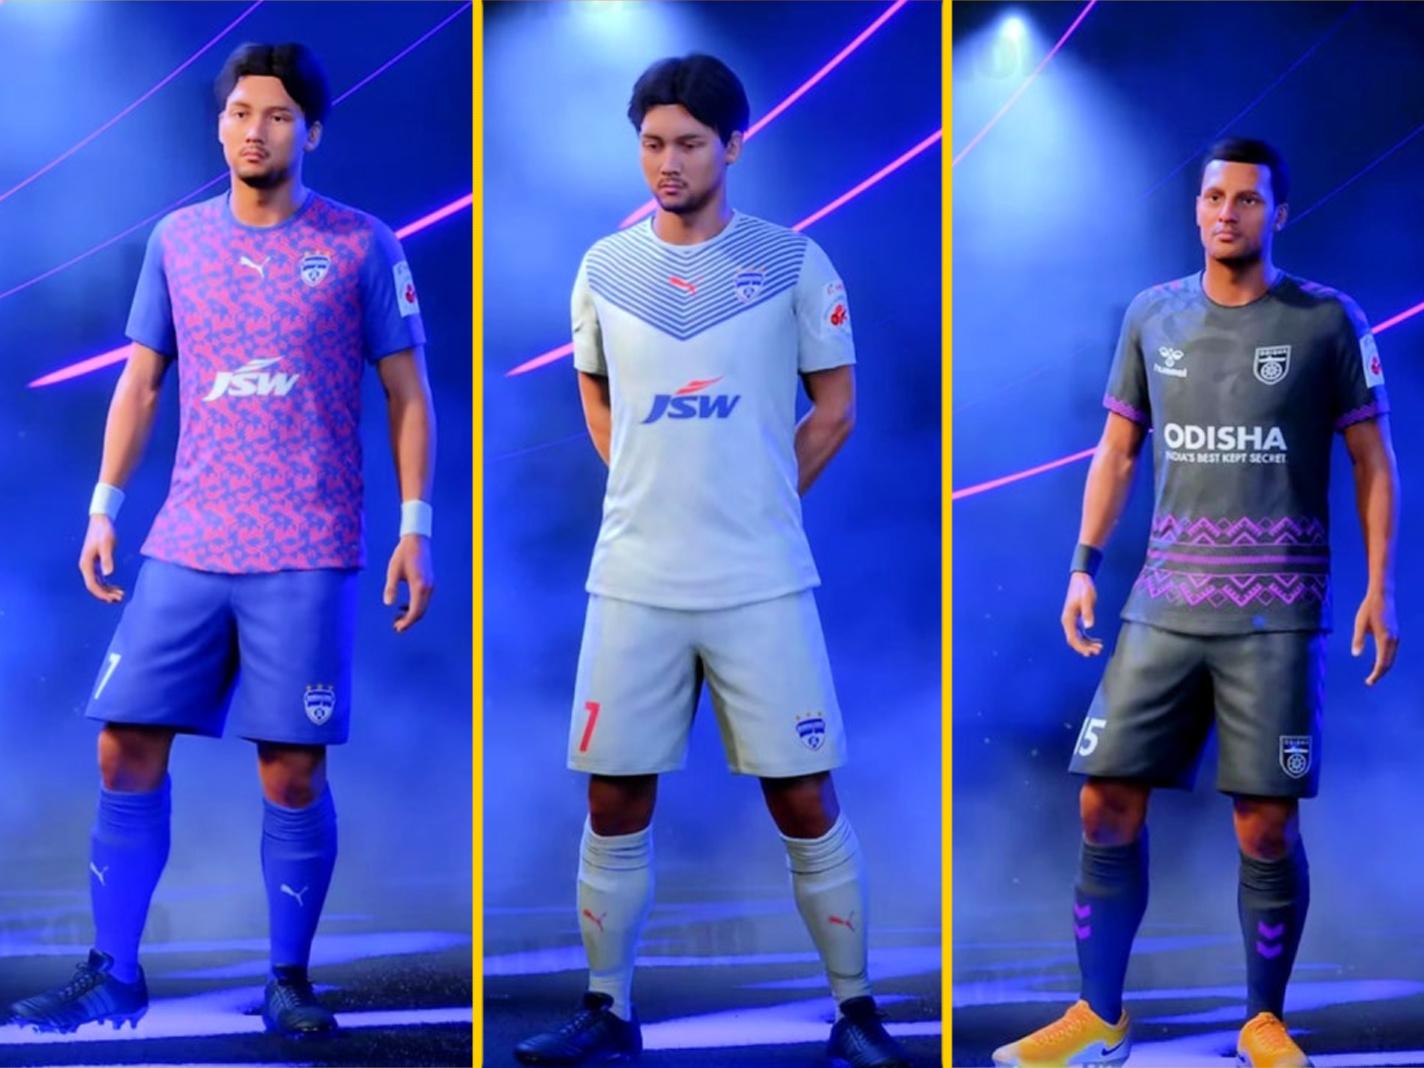 Indian Super League kits in FIFA 22